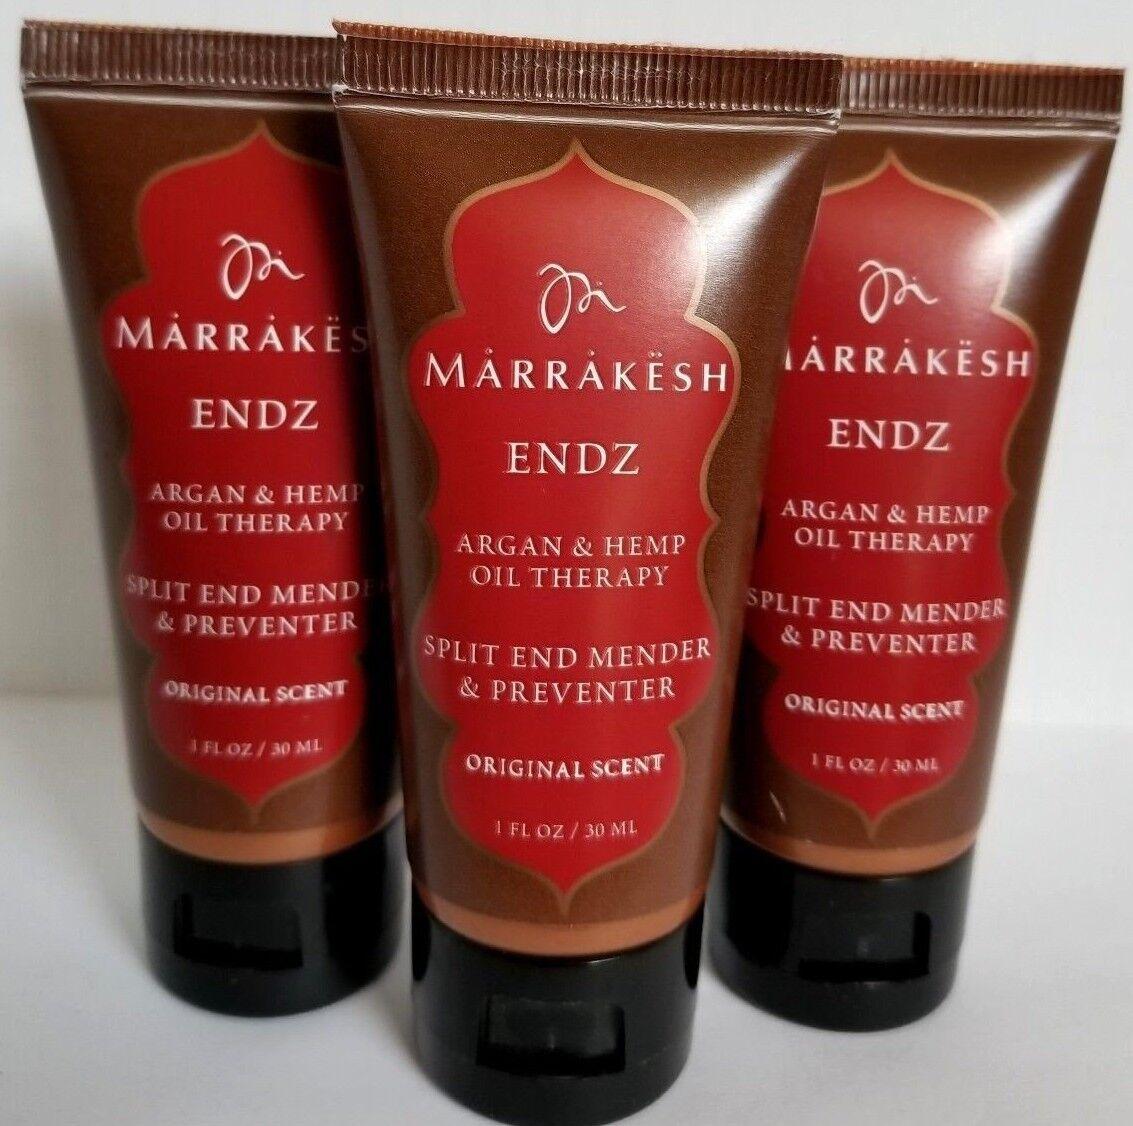 3 pcs MARRAKESH ENDZ Split End Mender Argan & Hemp Seed Oil